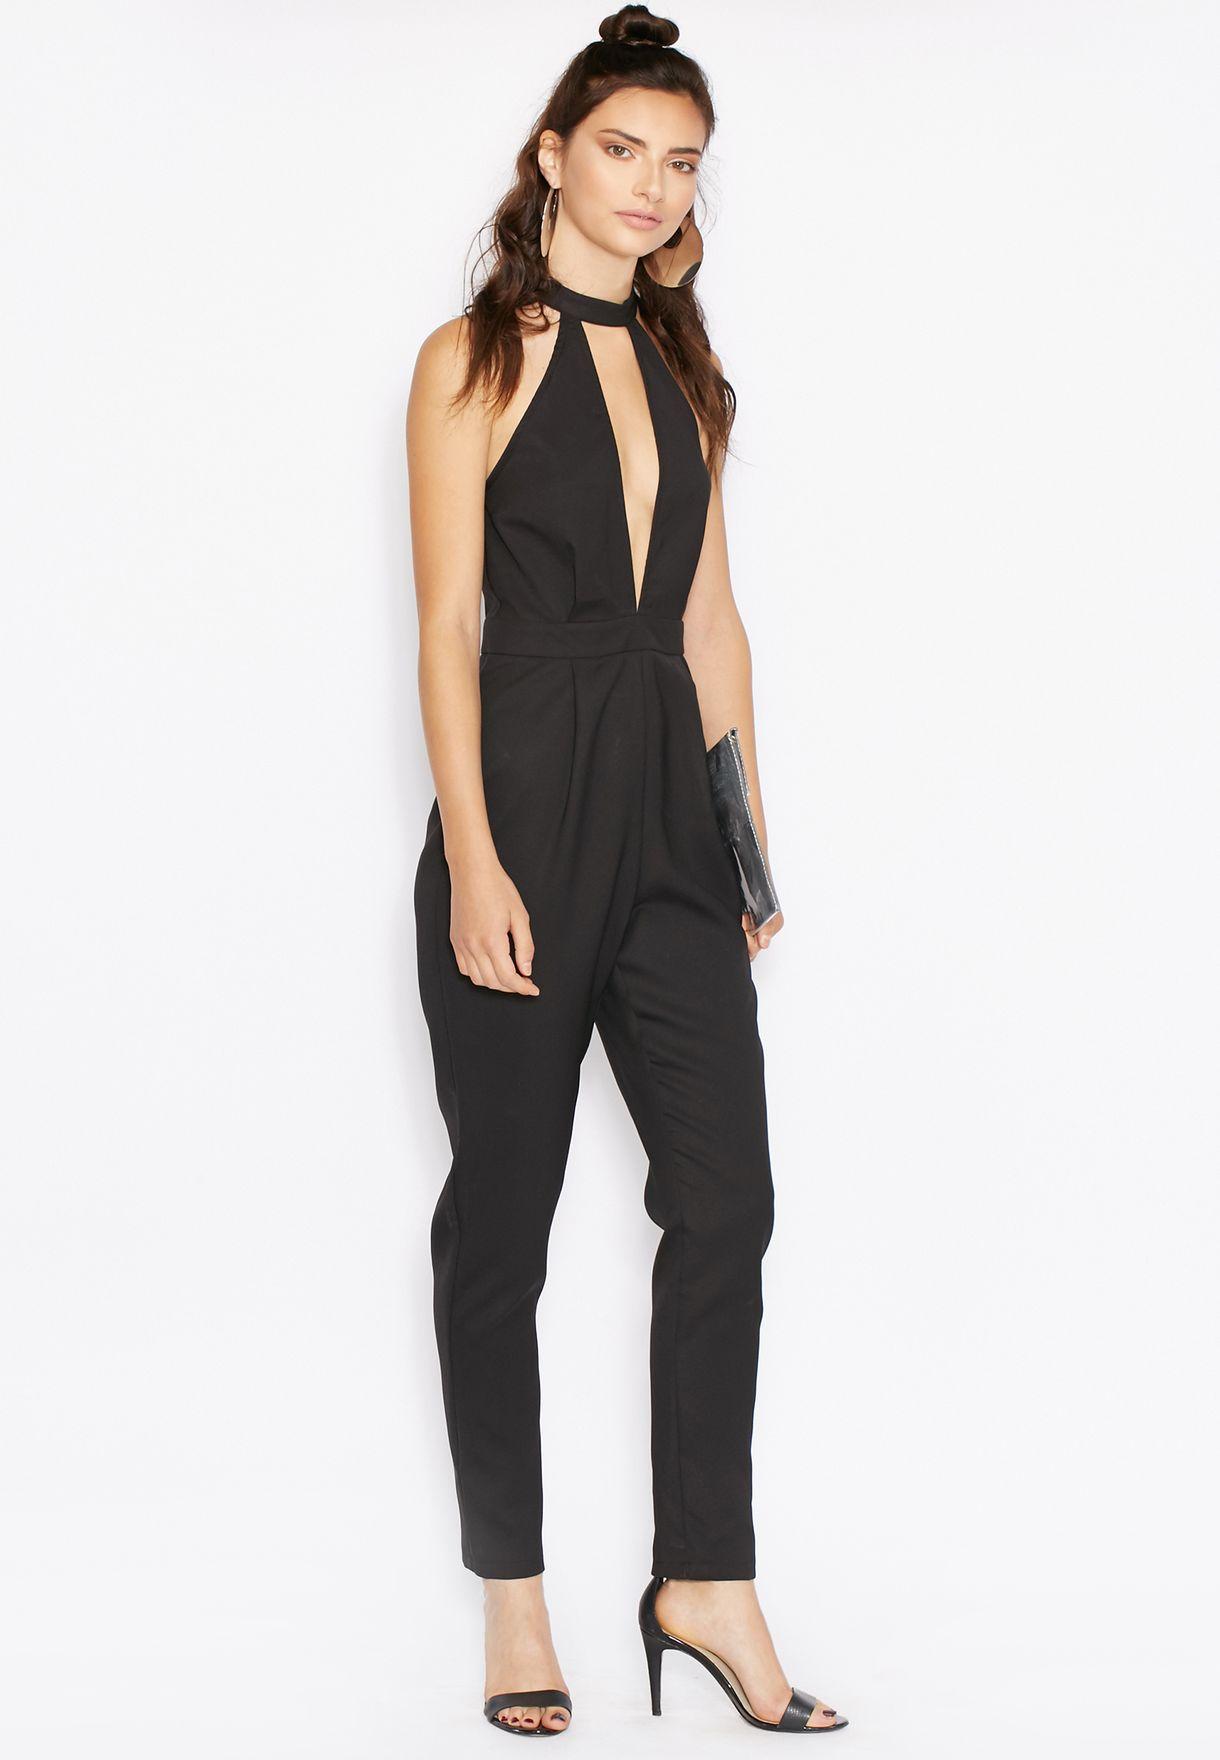 73de7686681 Shop Missguided black Choker Plunge Jumpsuit for Women in Qatar -  MI669AT38VTL